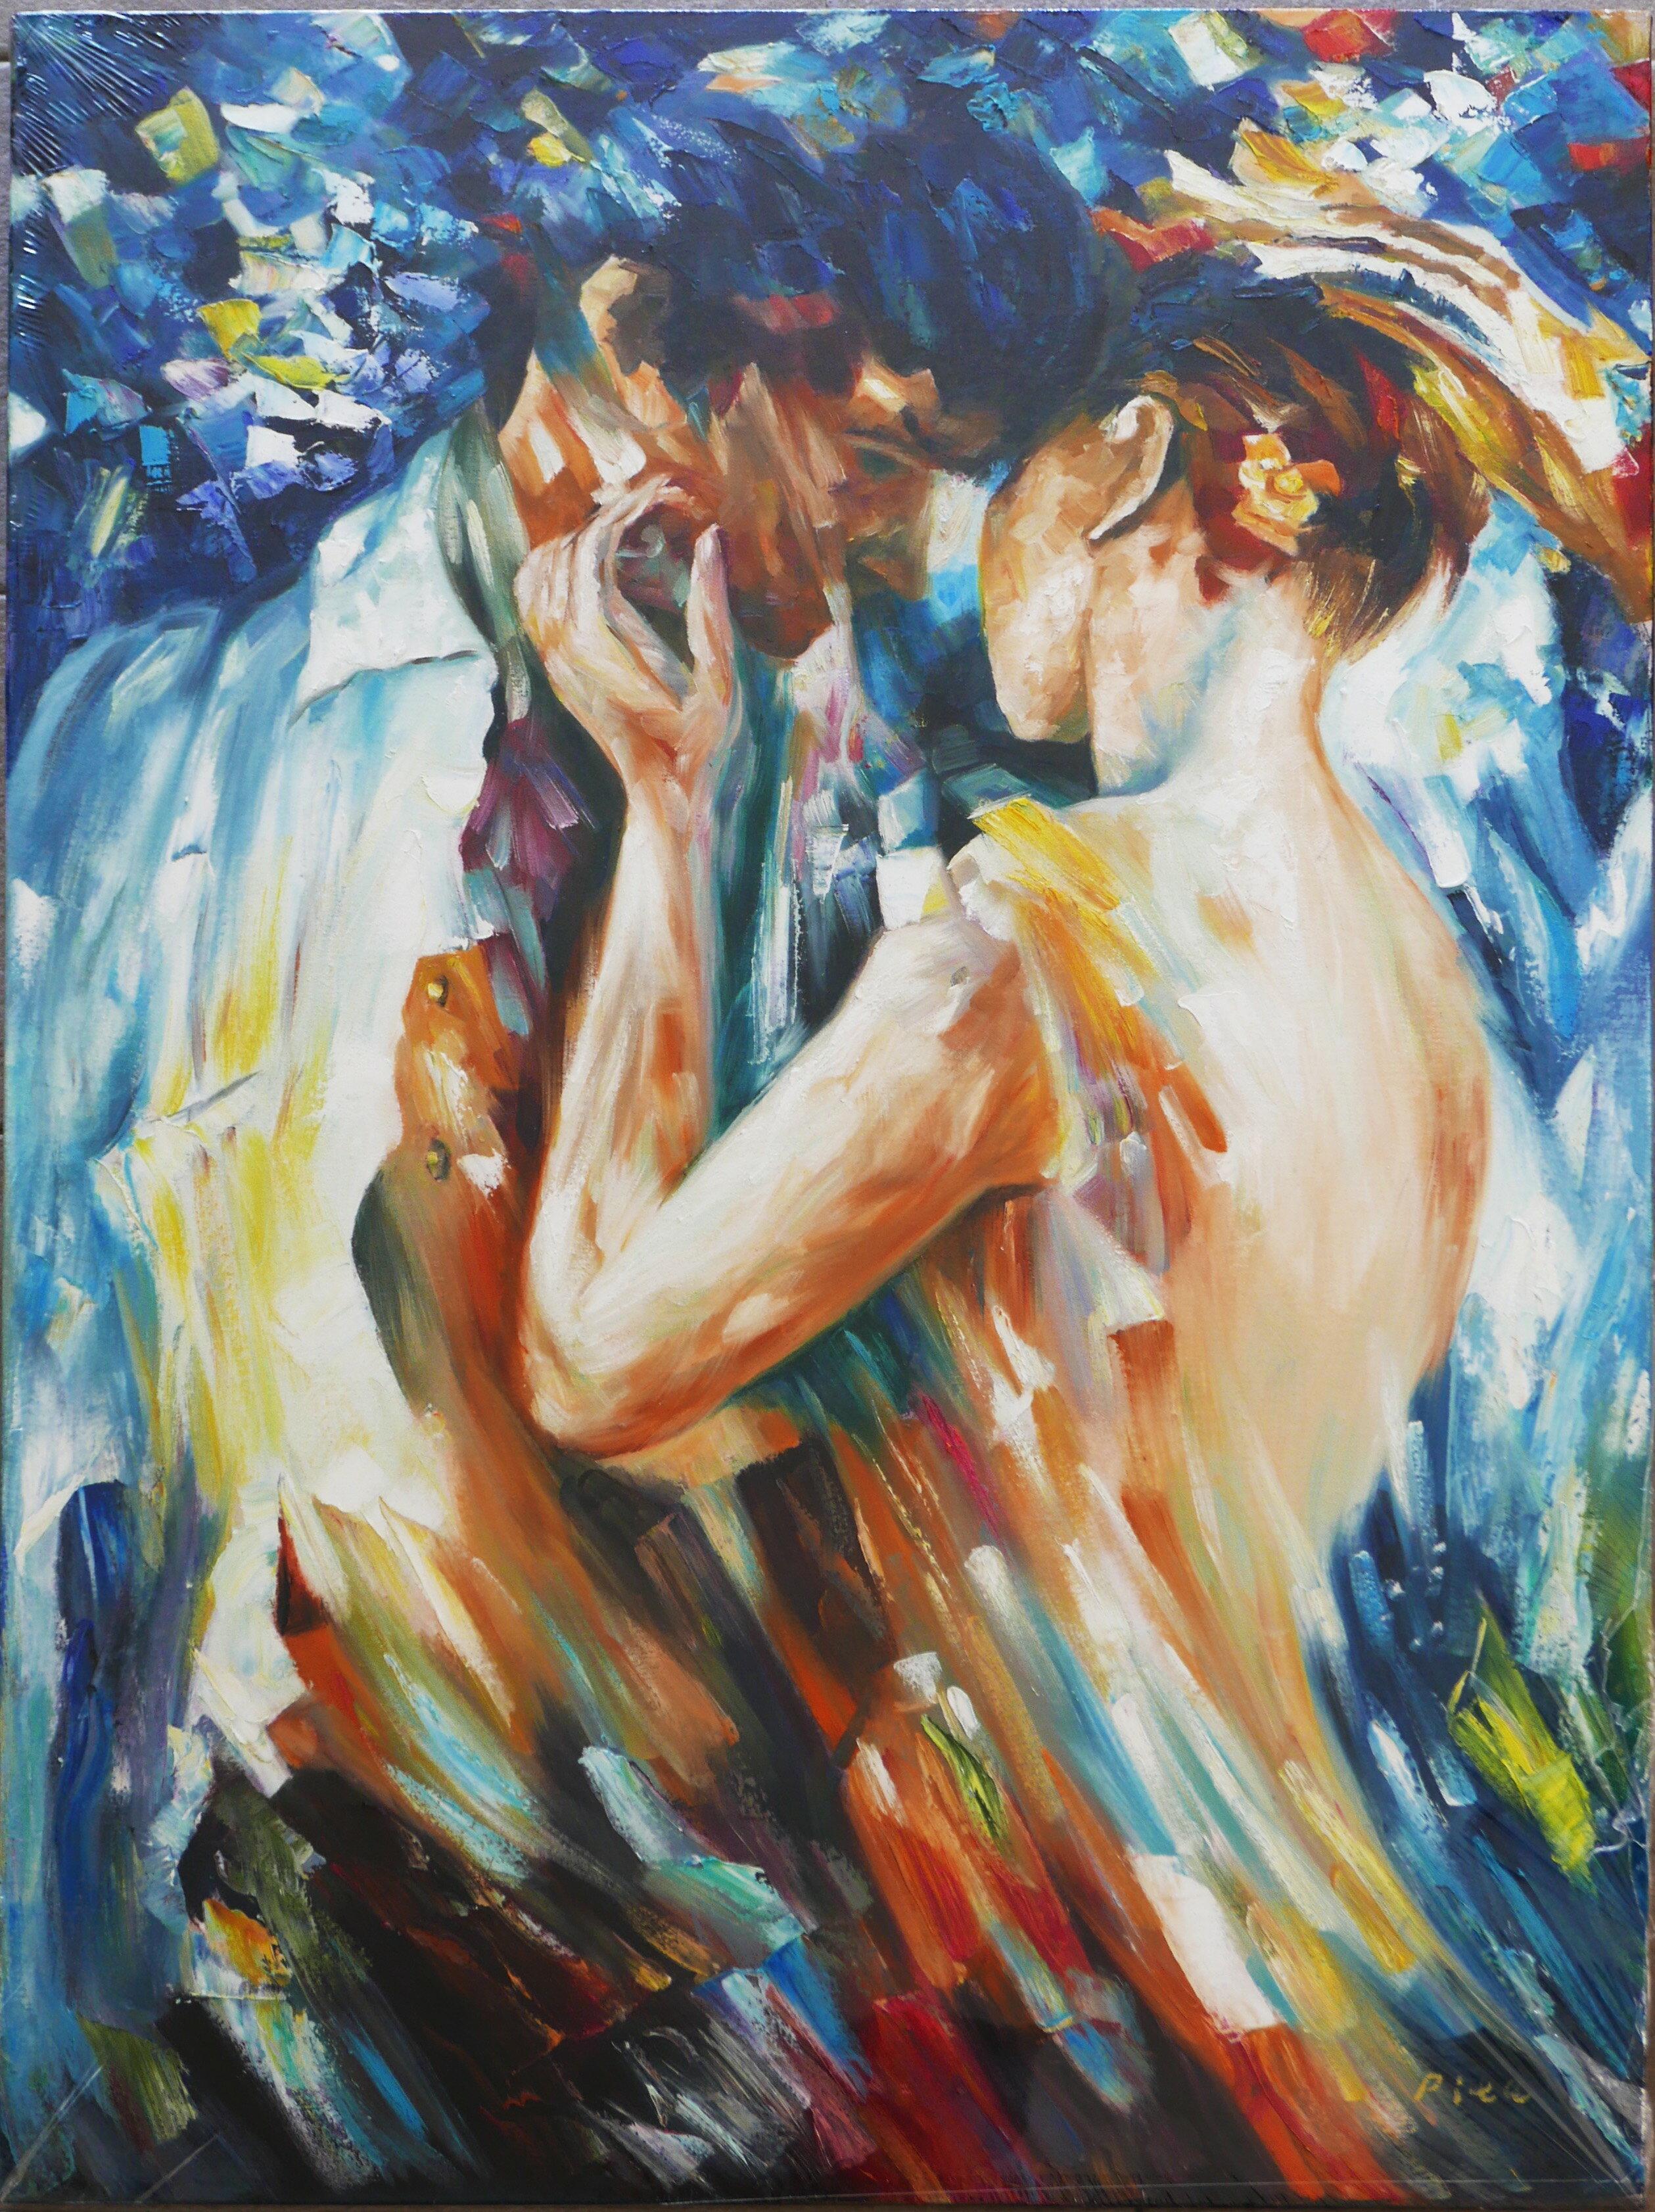 聚鯨Cetacea﹡Art【Untitled / Rita】進口油畫 無框畫 手繪油畫